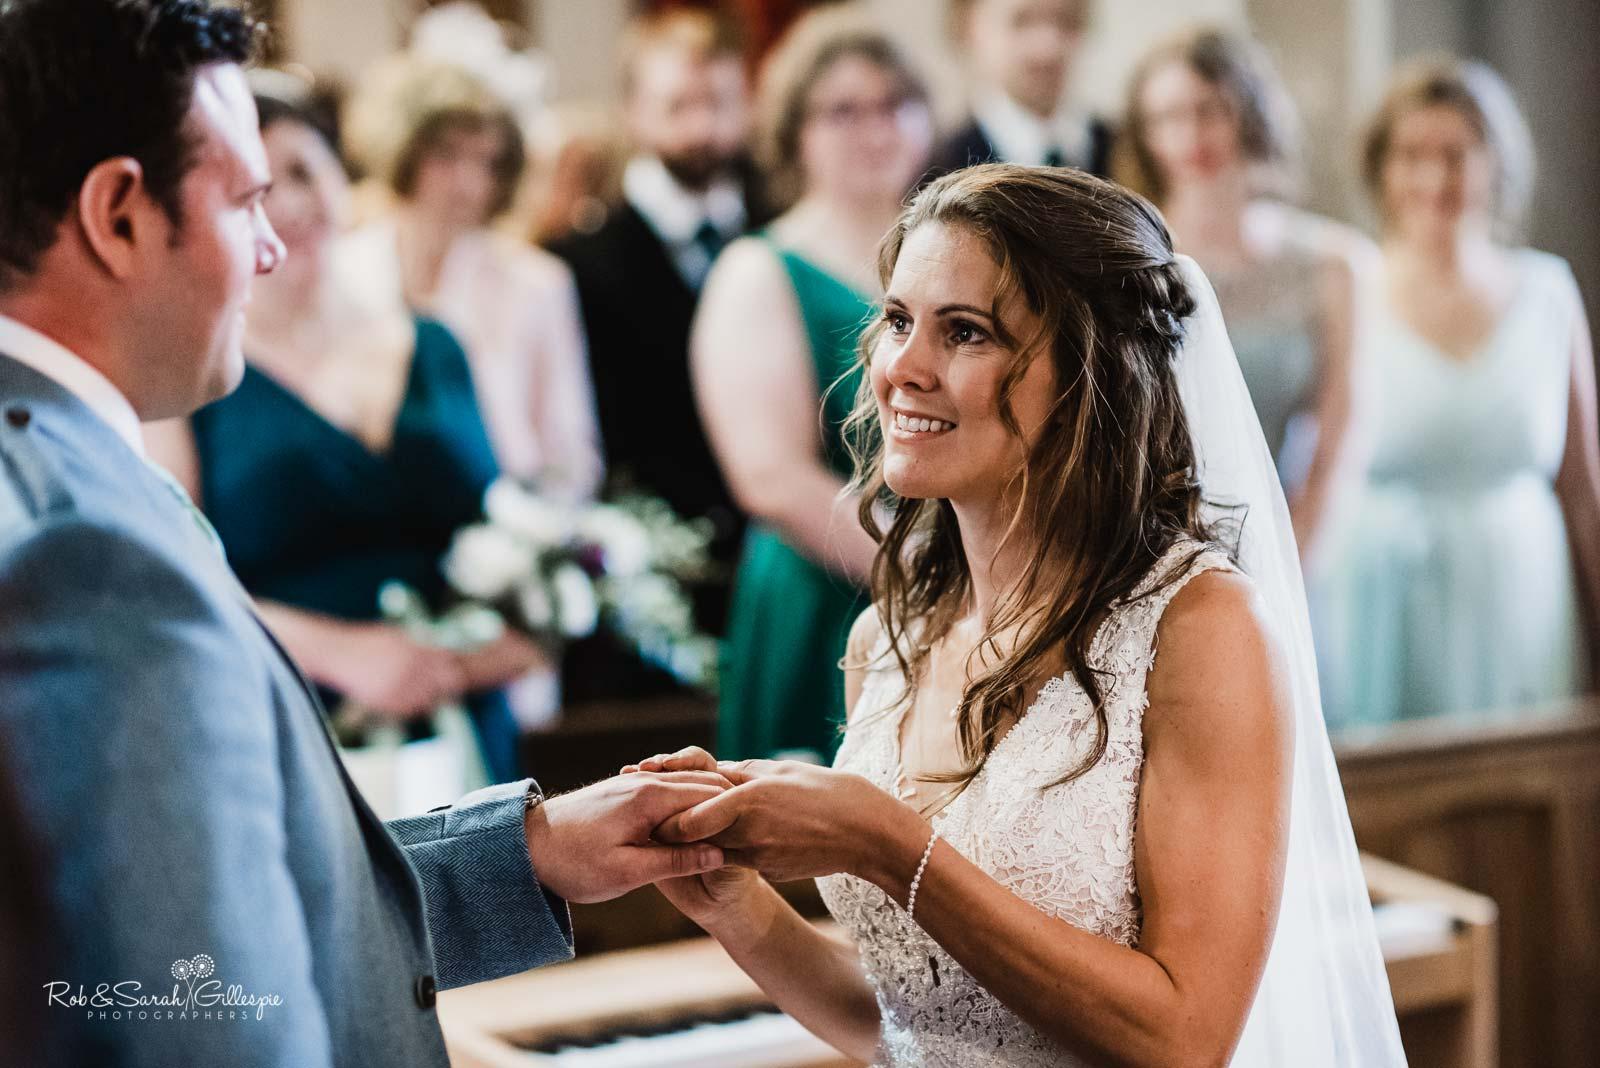 Bride and groom exchange rings at St Giles church Packwood wedding